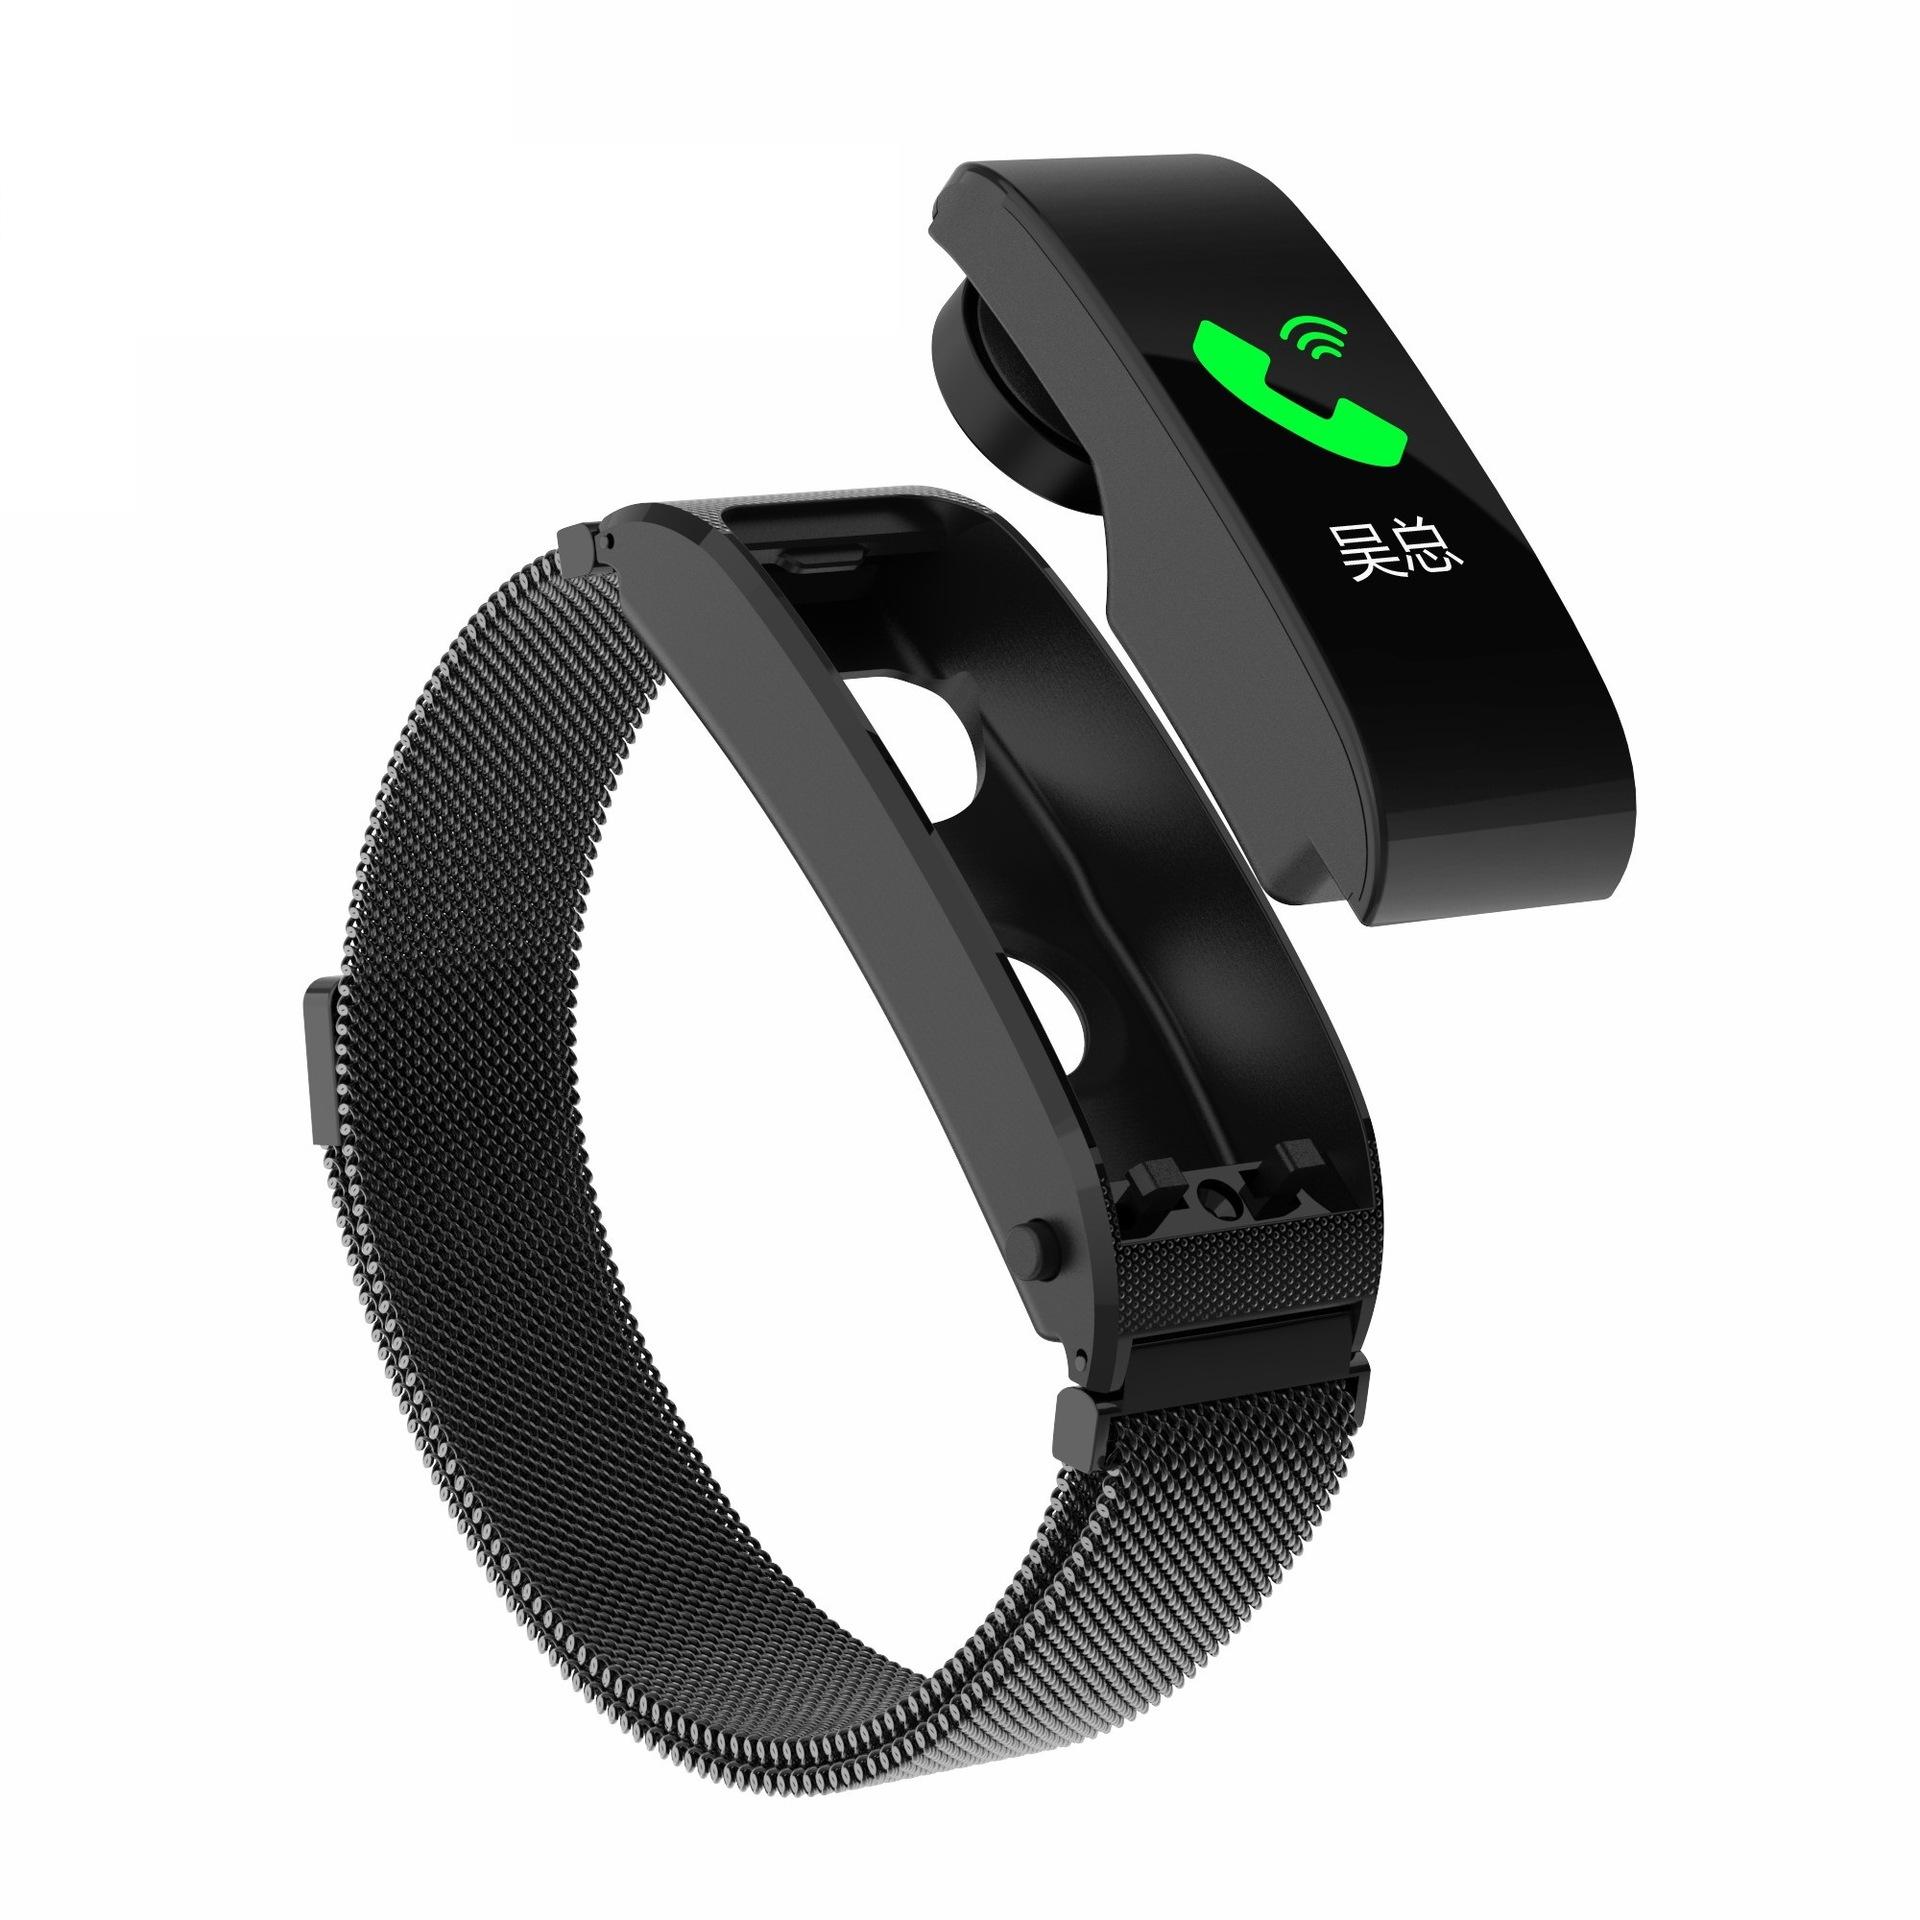 F2pro智能手环分离式智能手环蓝牙通话耳机二合一接电话播放音乐